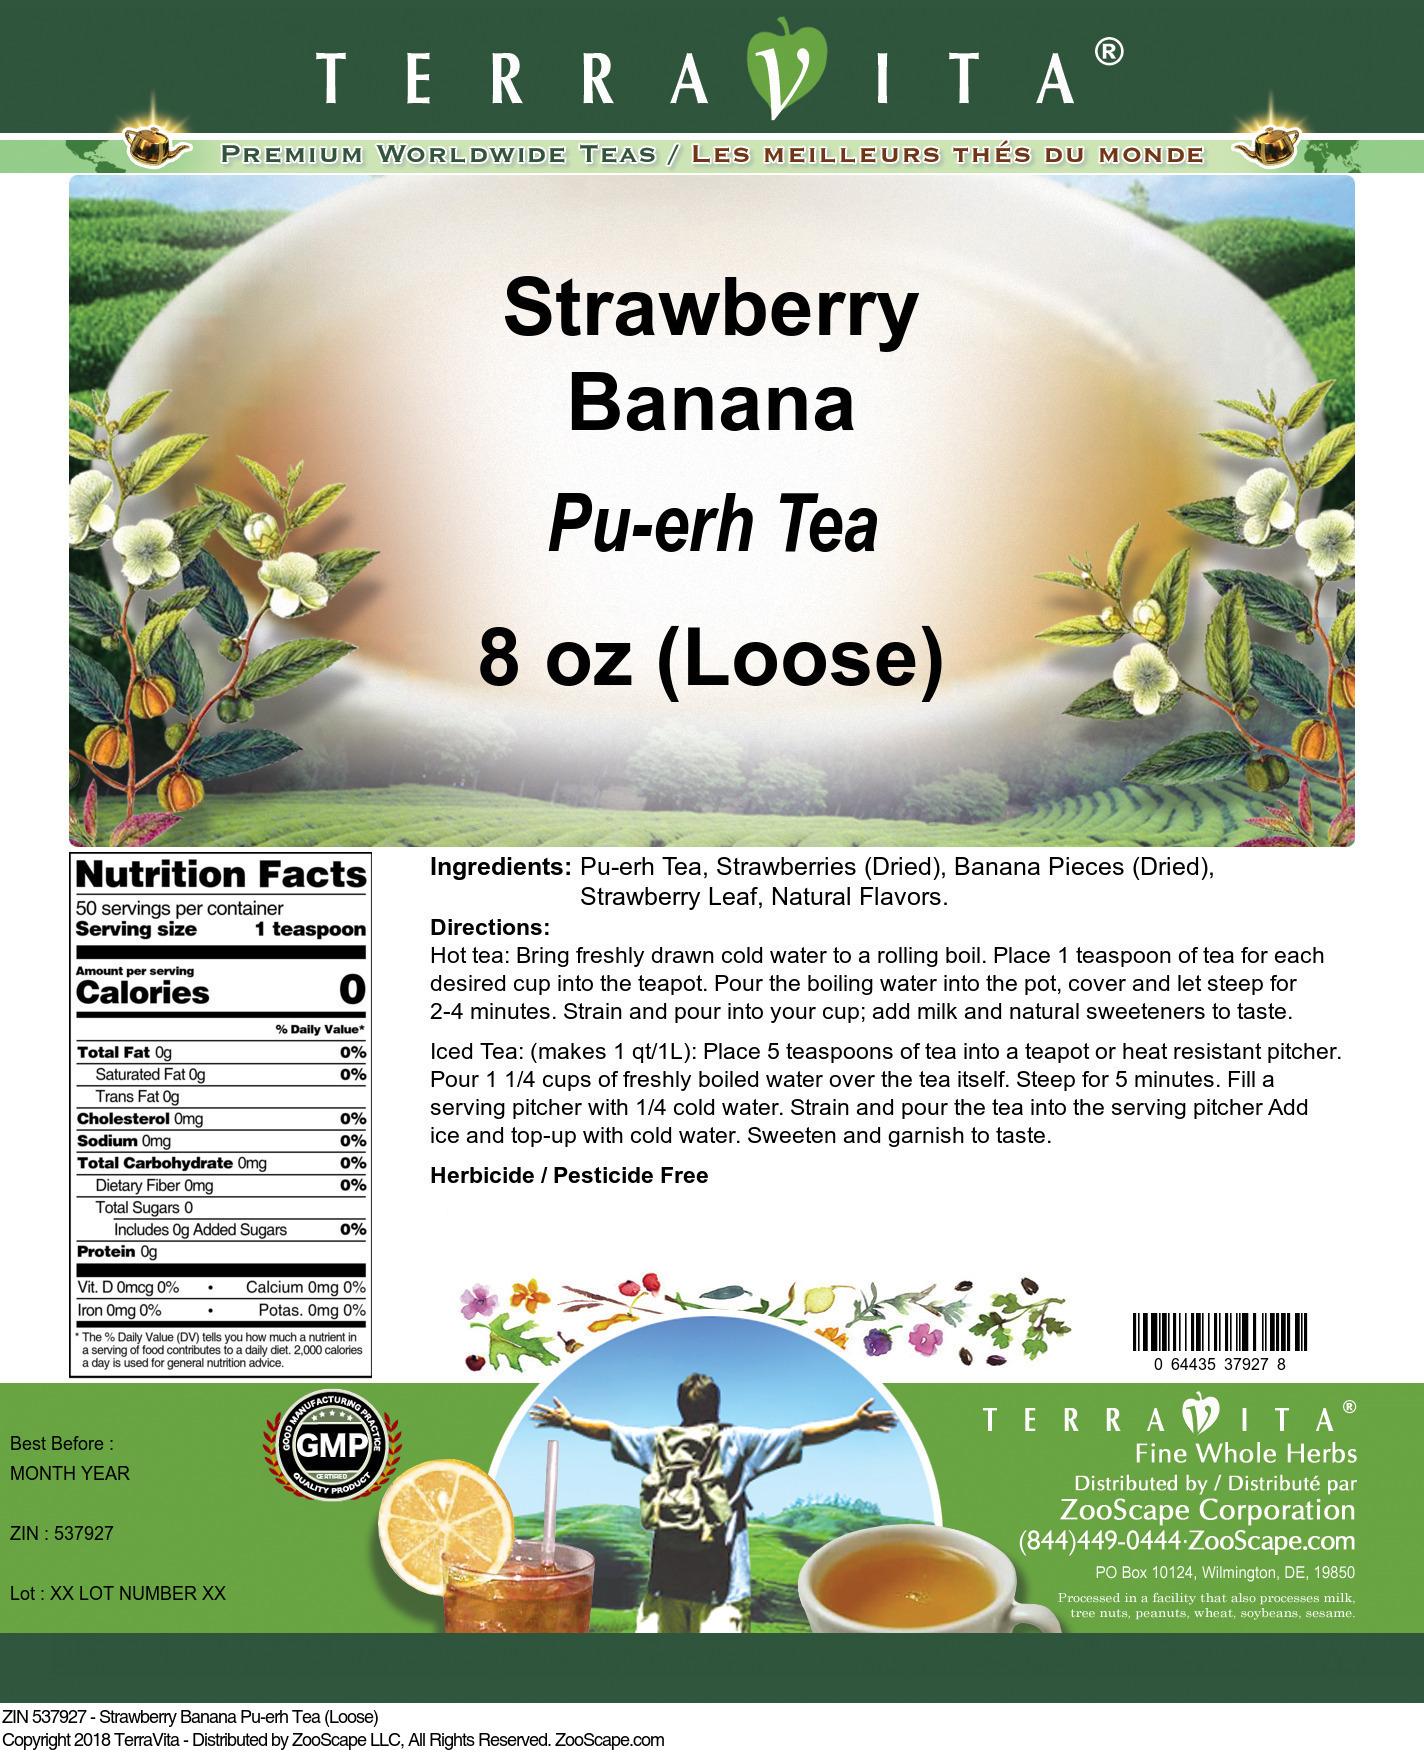 Strawberry Banana Pu-erh Tea